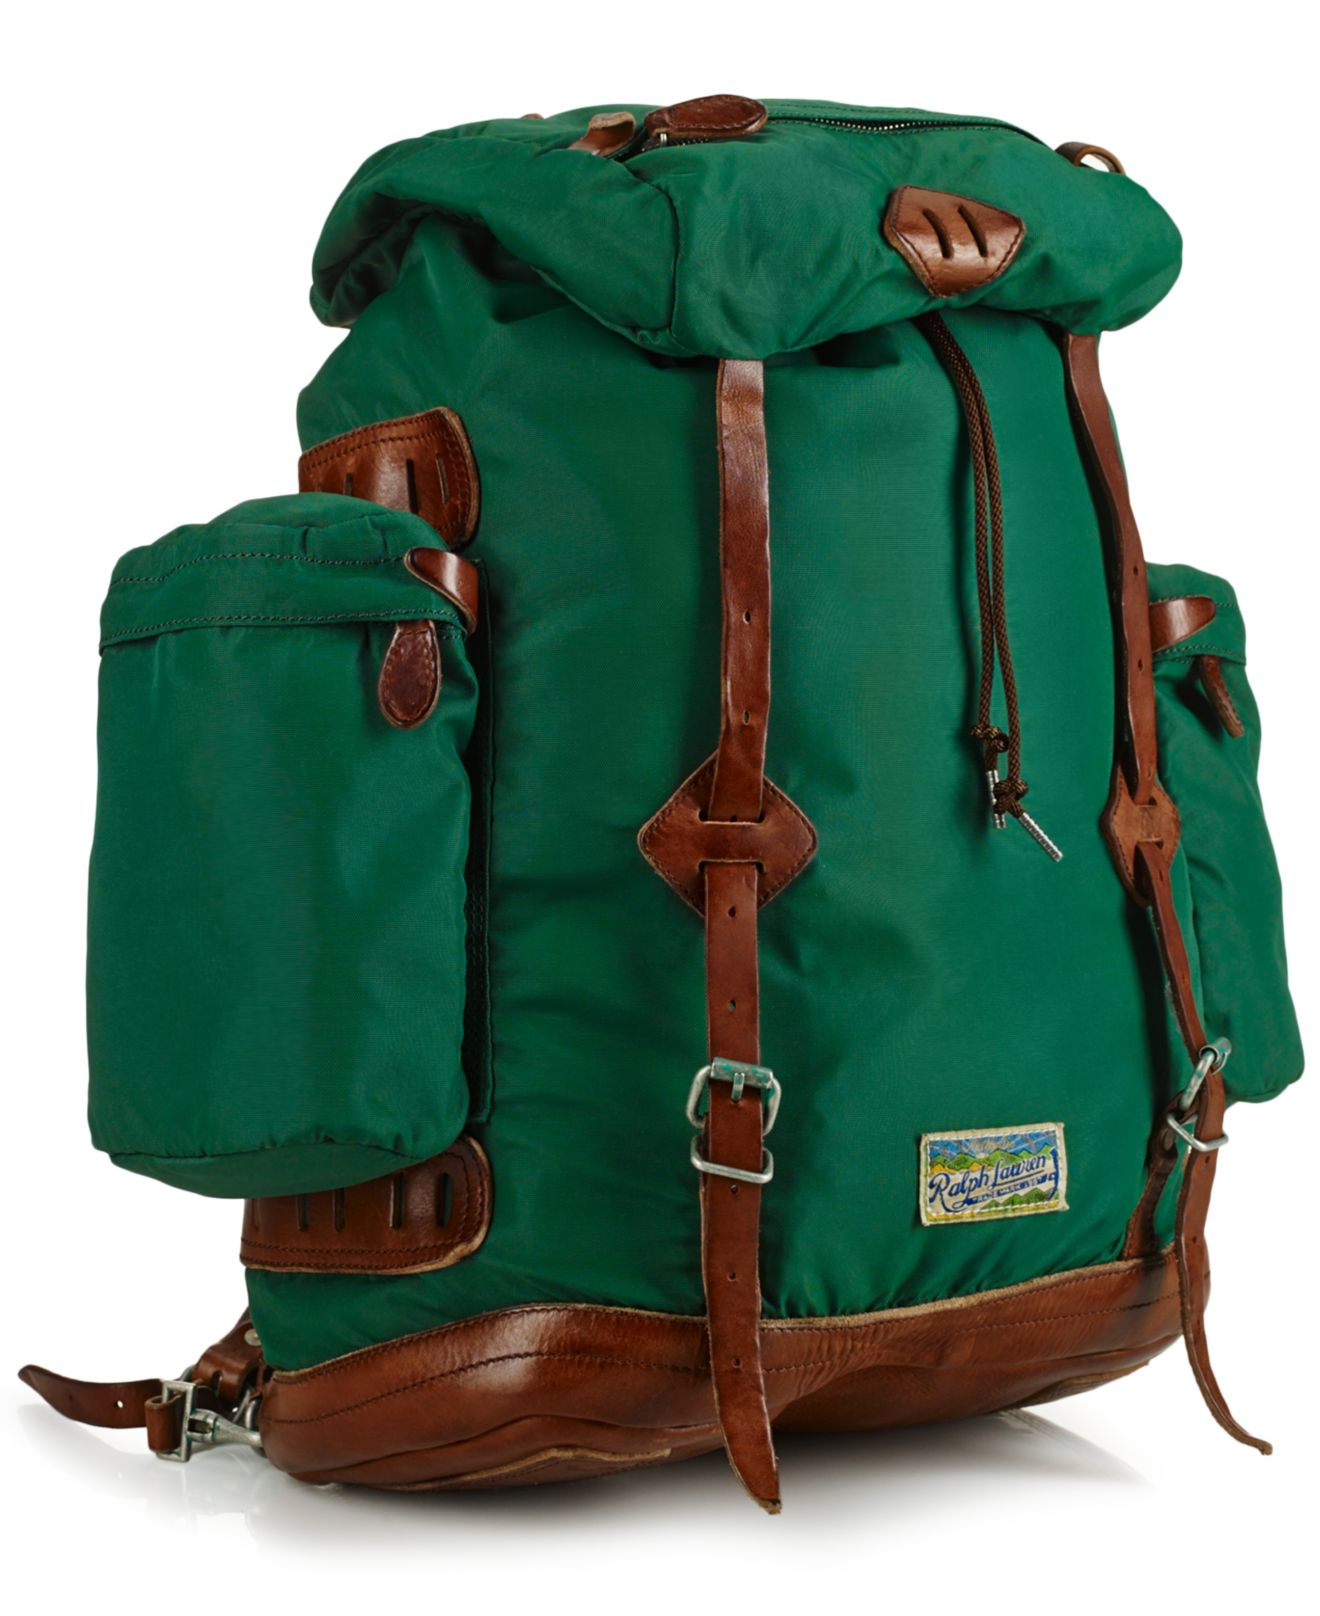 6442e6af05 Lyst - Polo Ralph Lauren Yosemite Nylon Backpack in Green for Men